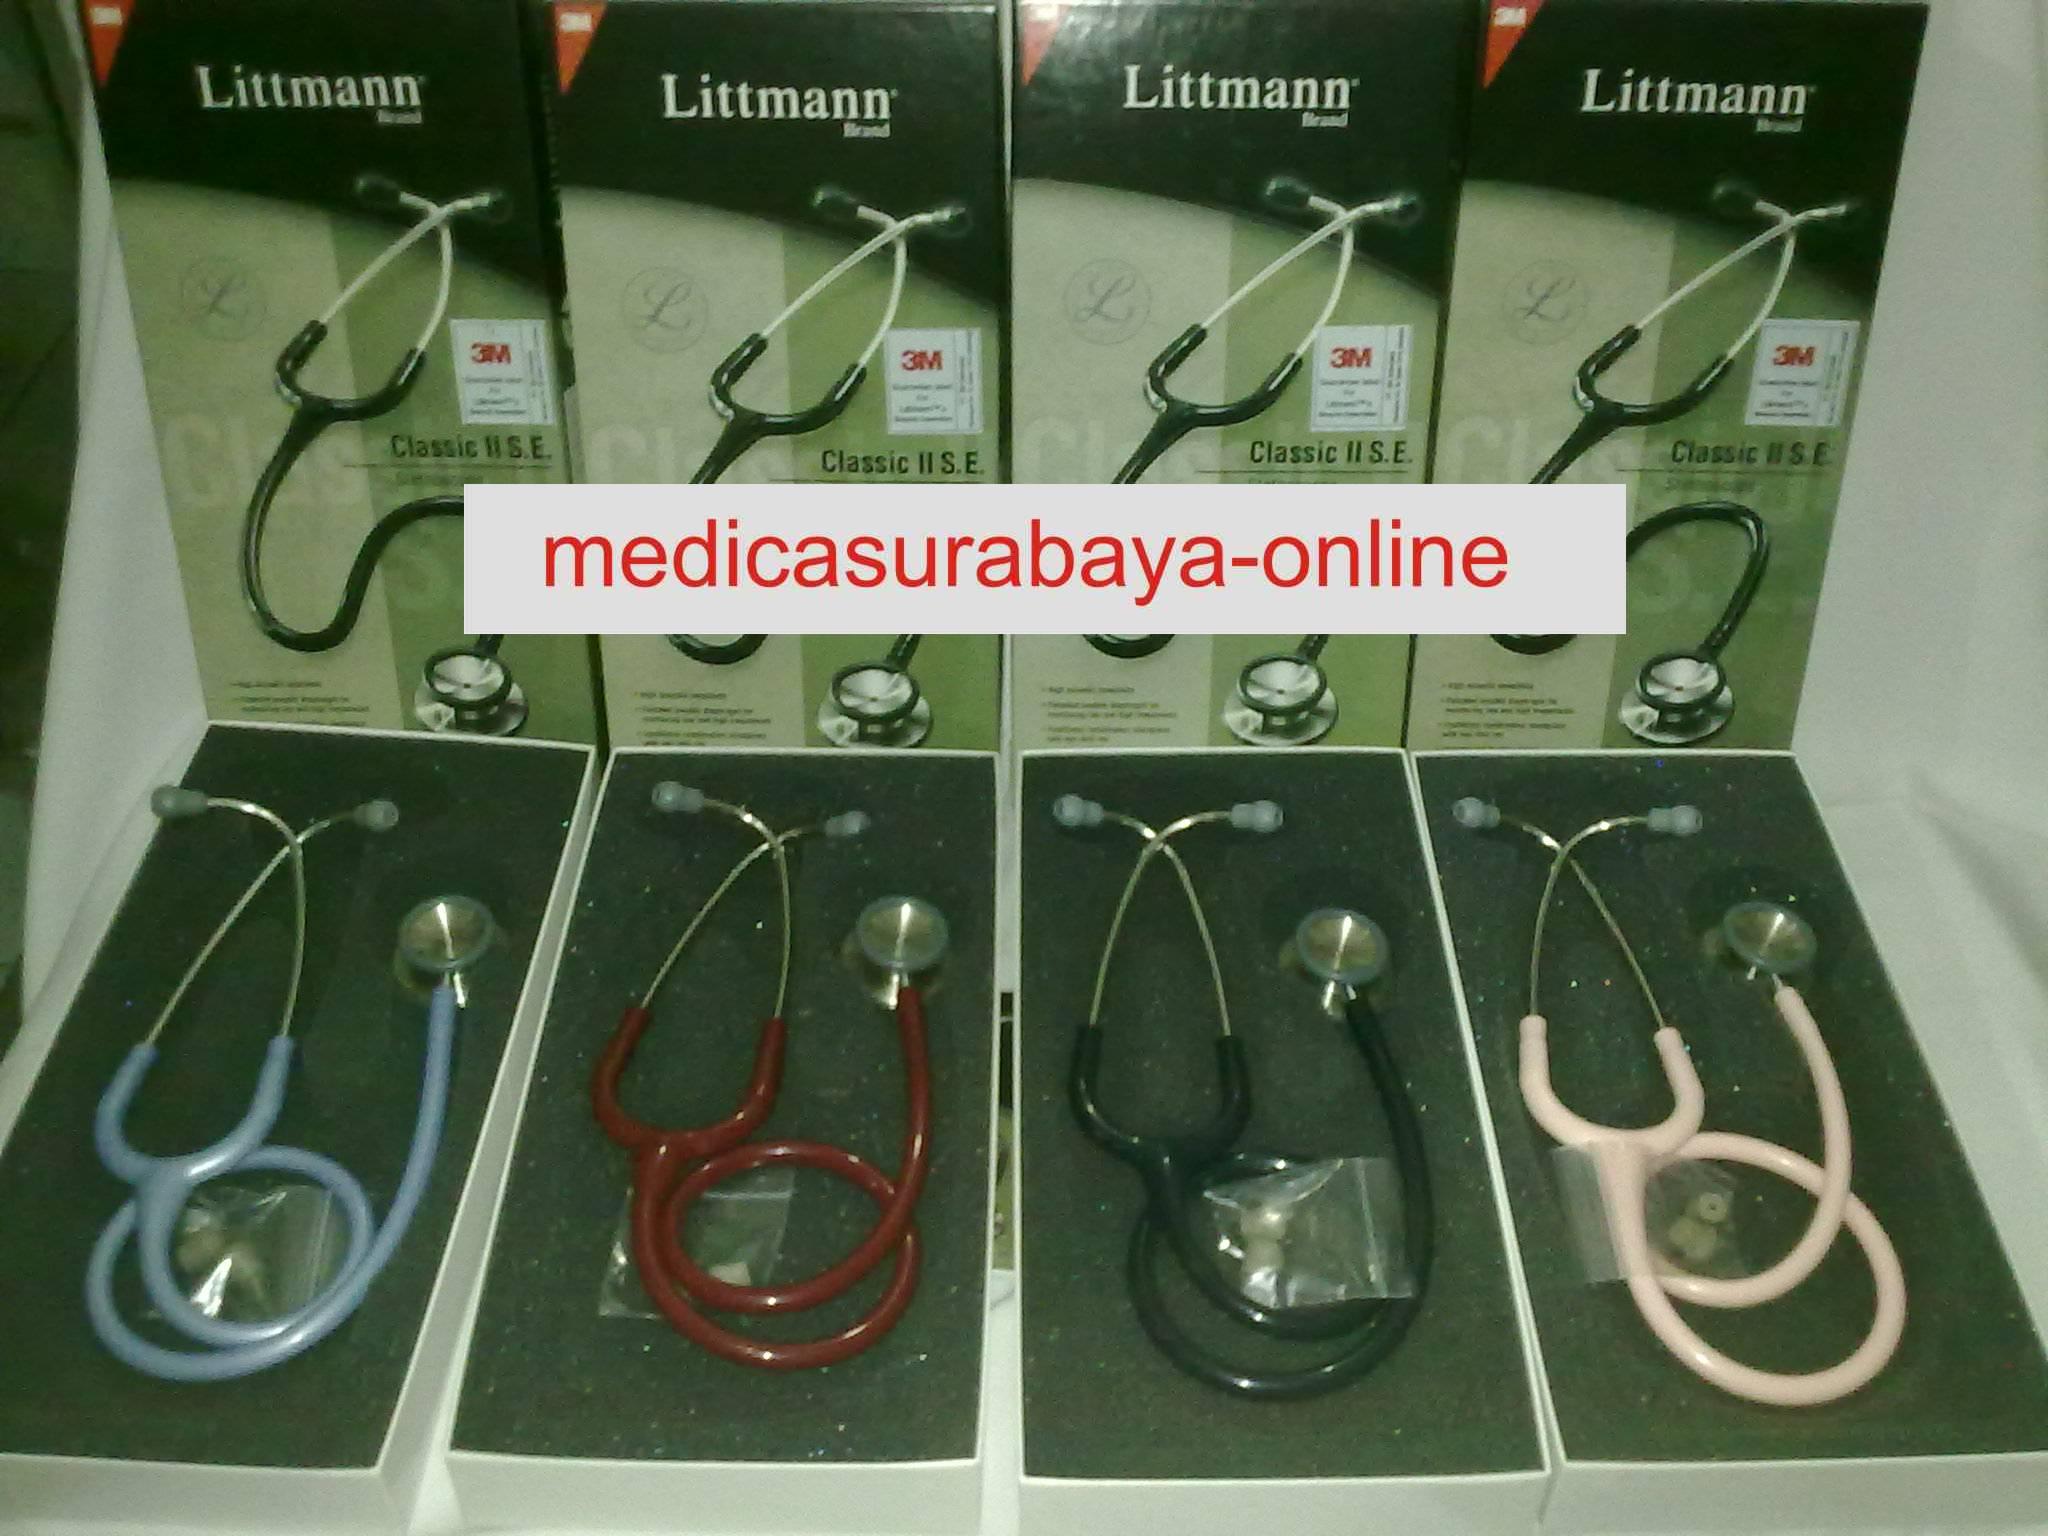 http://alatmedismahasiswa.files.wordpress.com/2011/04/stetoskop-littmann-classic-ii-s-e-internet1.jpg